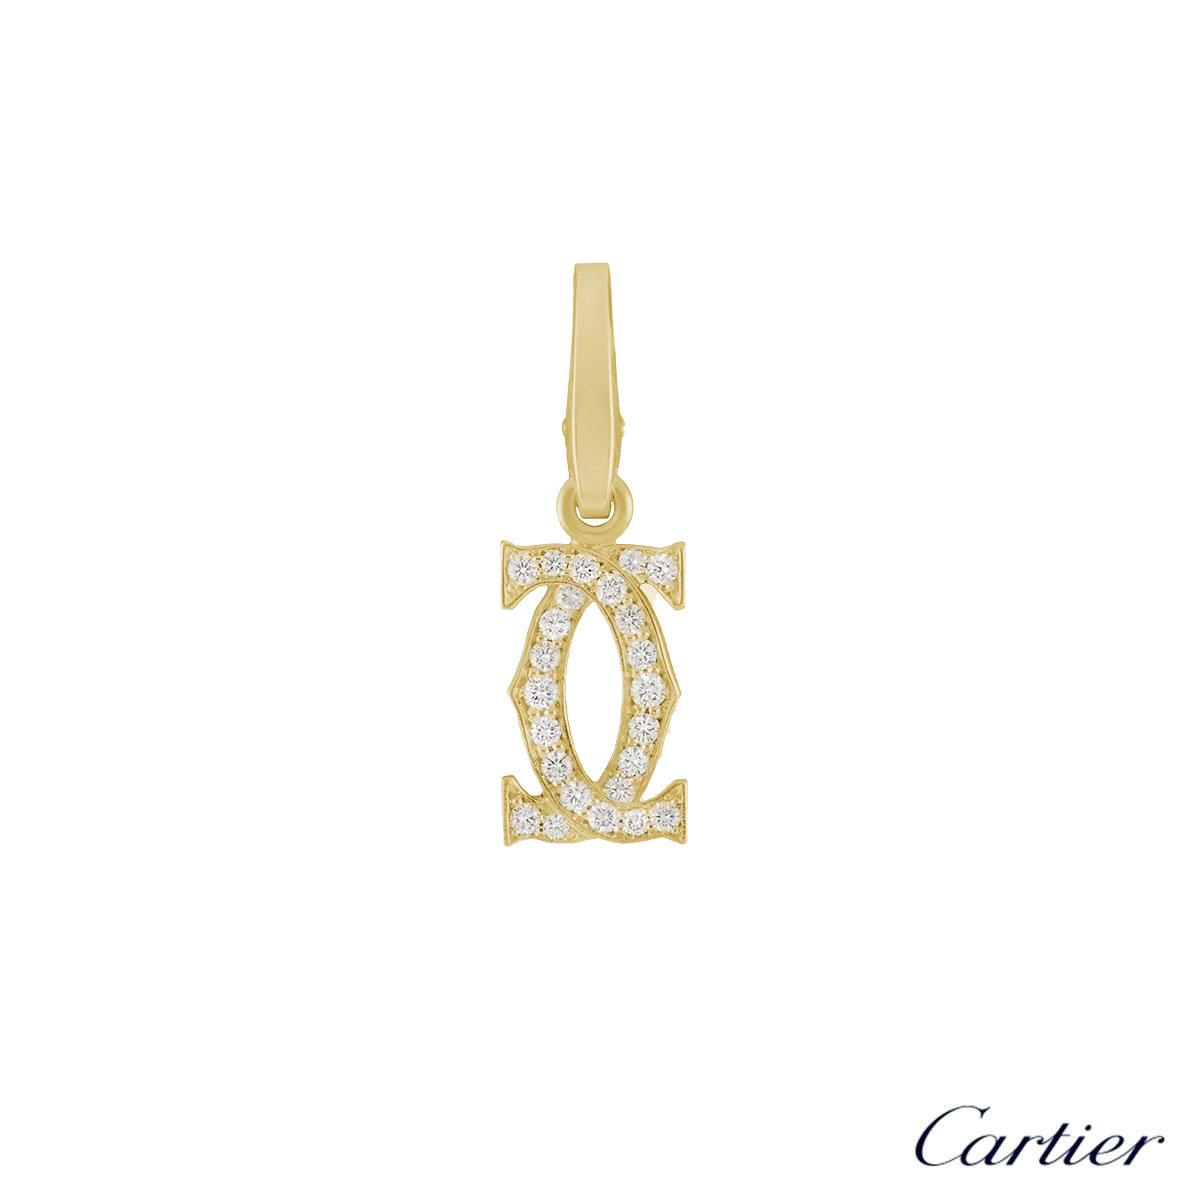 C de Cartier Yellow Gold Diamond Charm